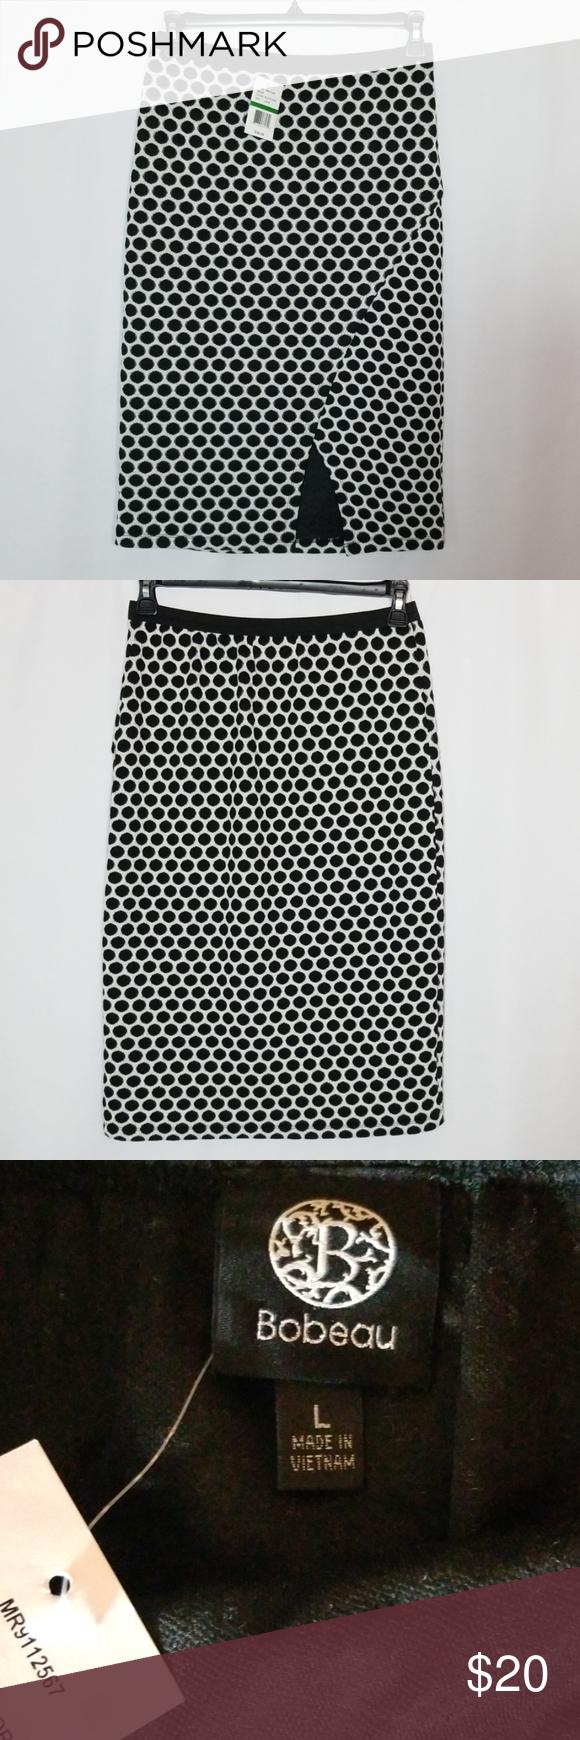 NWT Bobeau Polka Dot Skirt Size Large Brand new skirt! Elastic band waist and waist to hem is 27 inches.  #0502 bobeau Skirts